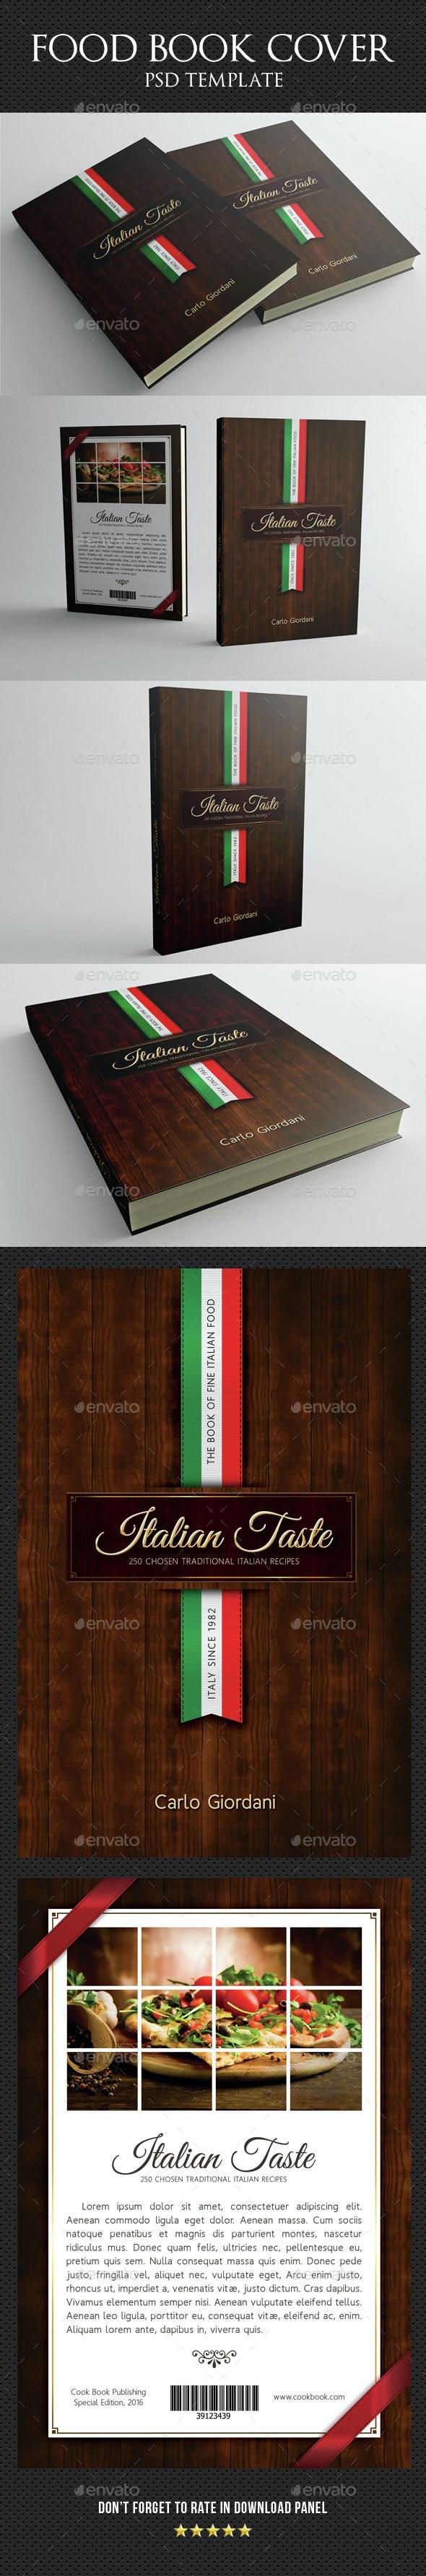 Italian Taste Book Cover Template - Miscellaneous Print Templates